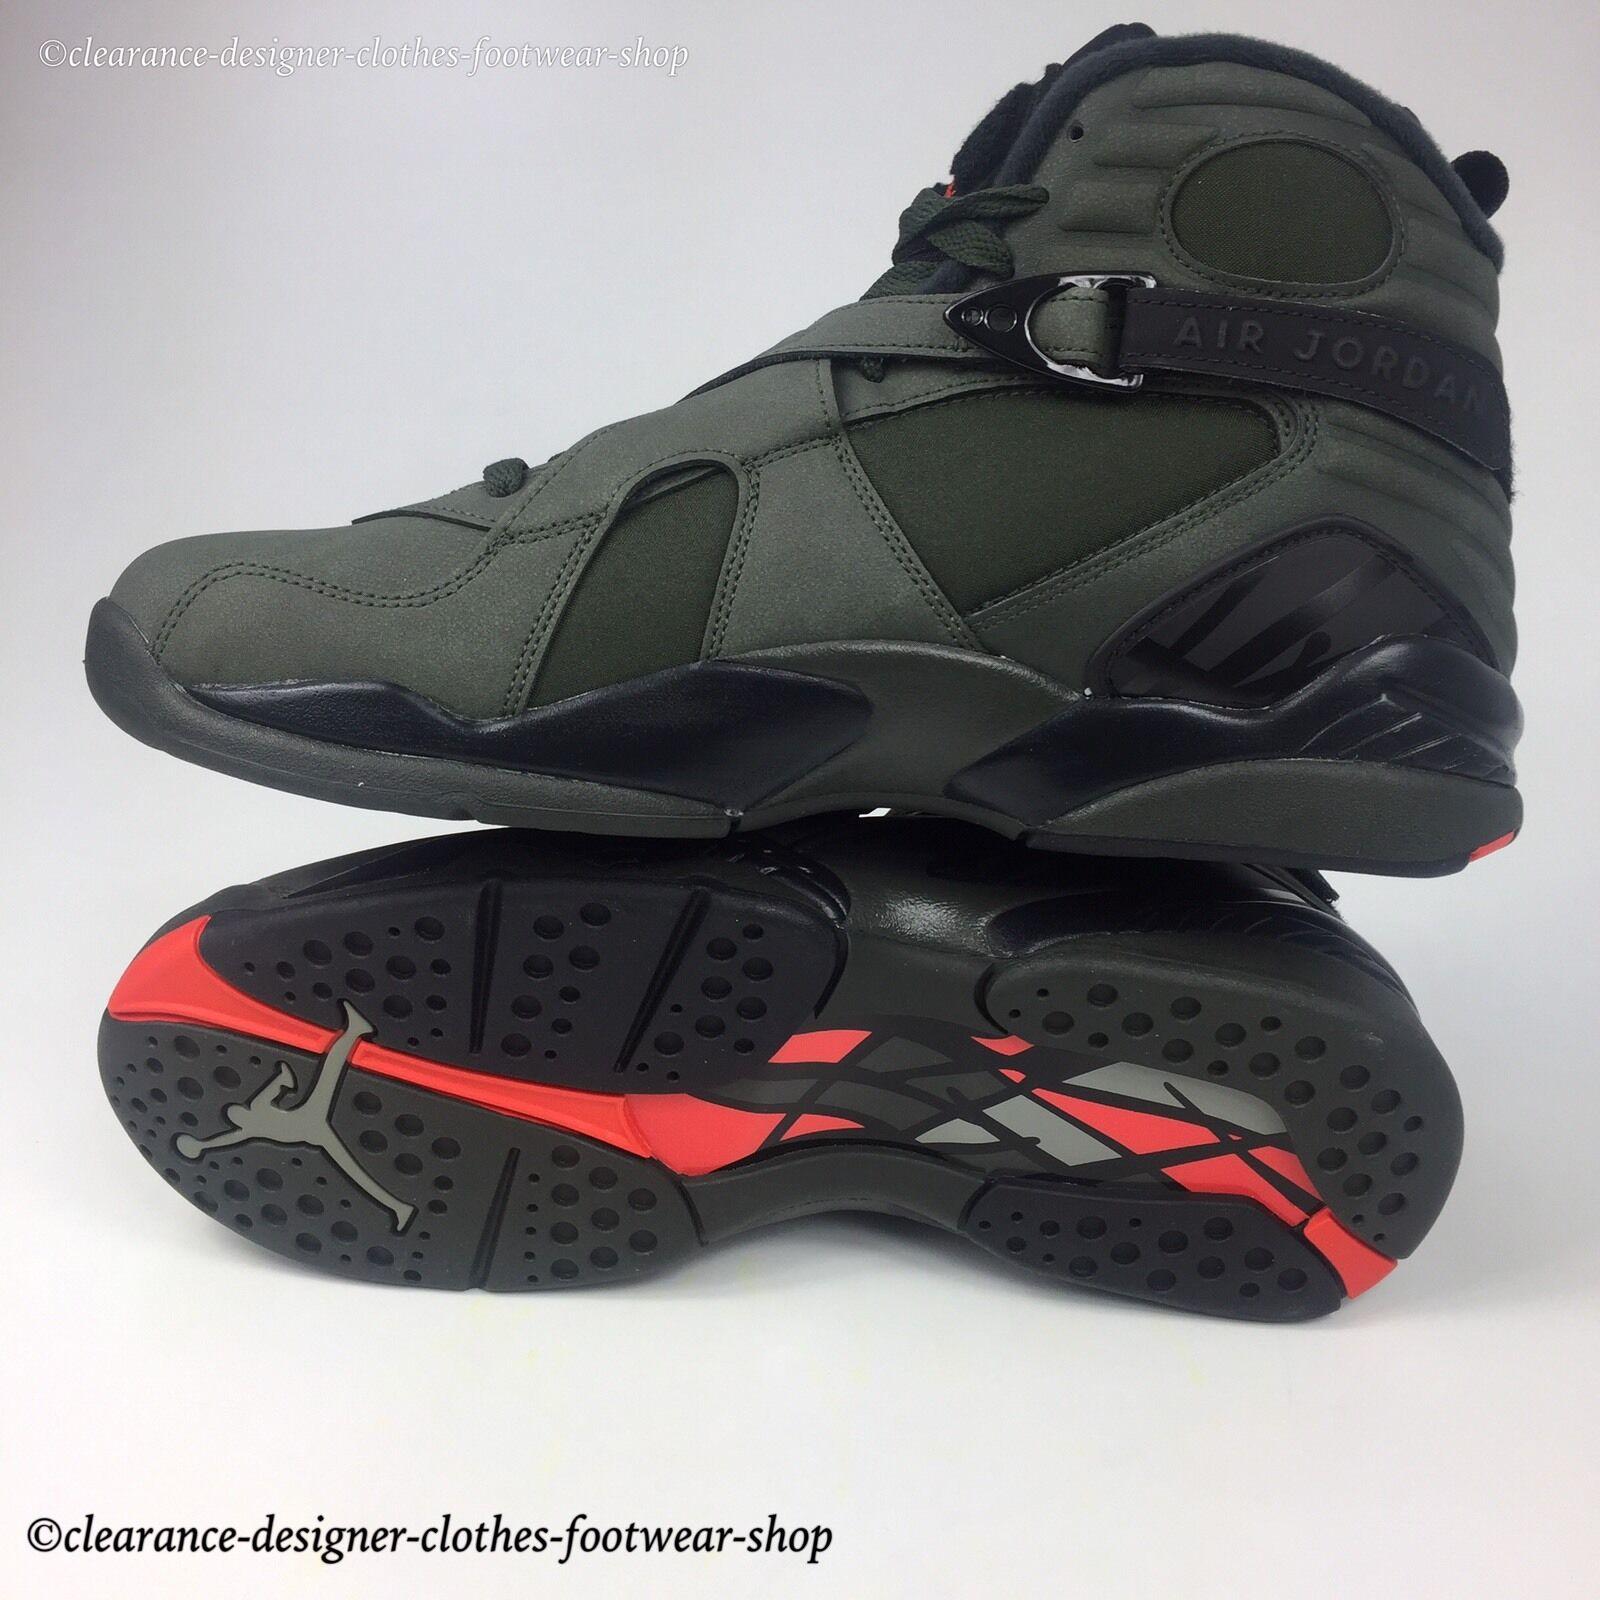 3750488fcdfc Nike Air Jordan 8 Retro VIII Take Flight Undefeated Sequoia Men Aj8  305381-305 UK 10 for sale online